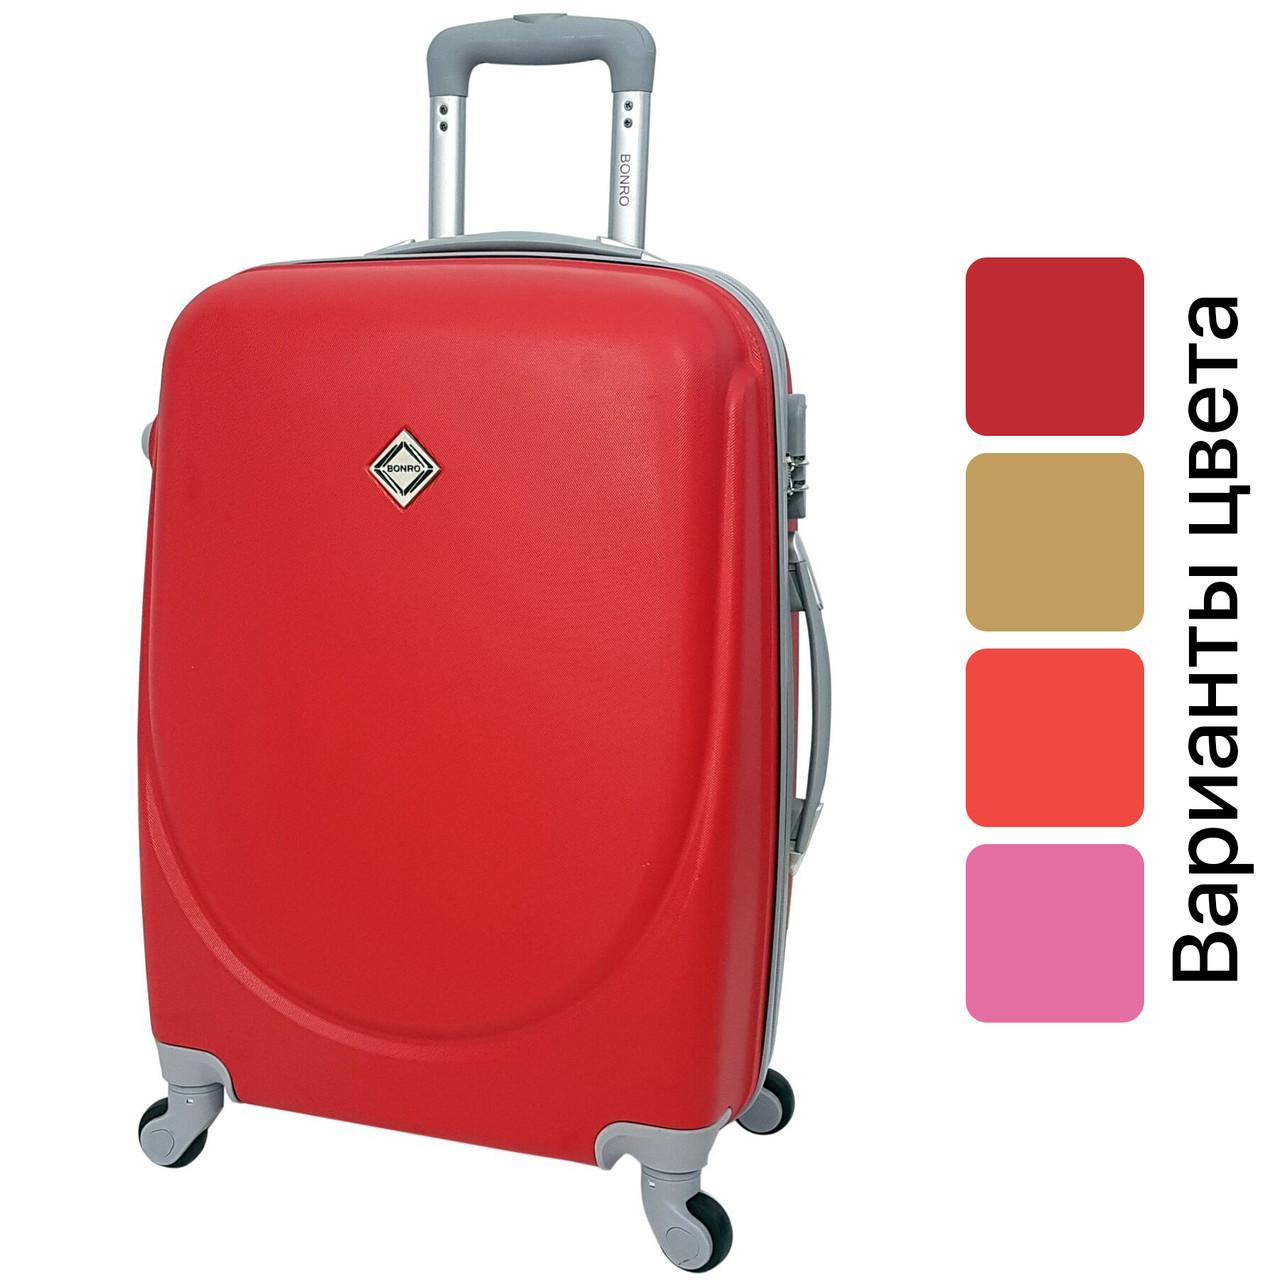 Дорожный чемодан на колесах Bonro Smile средний